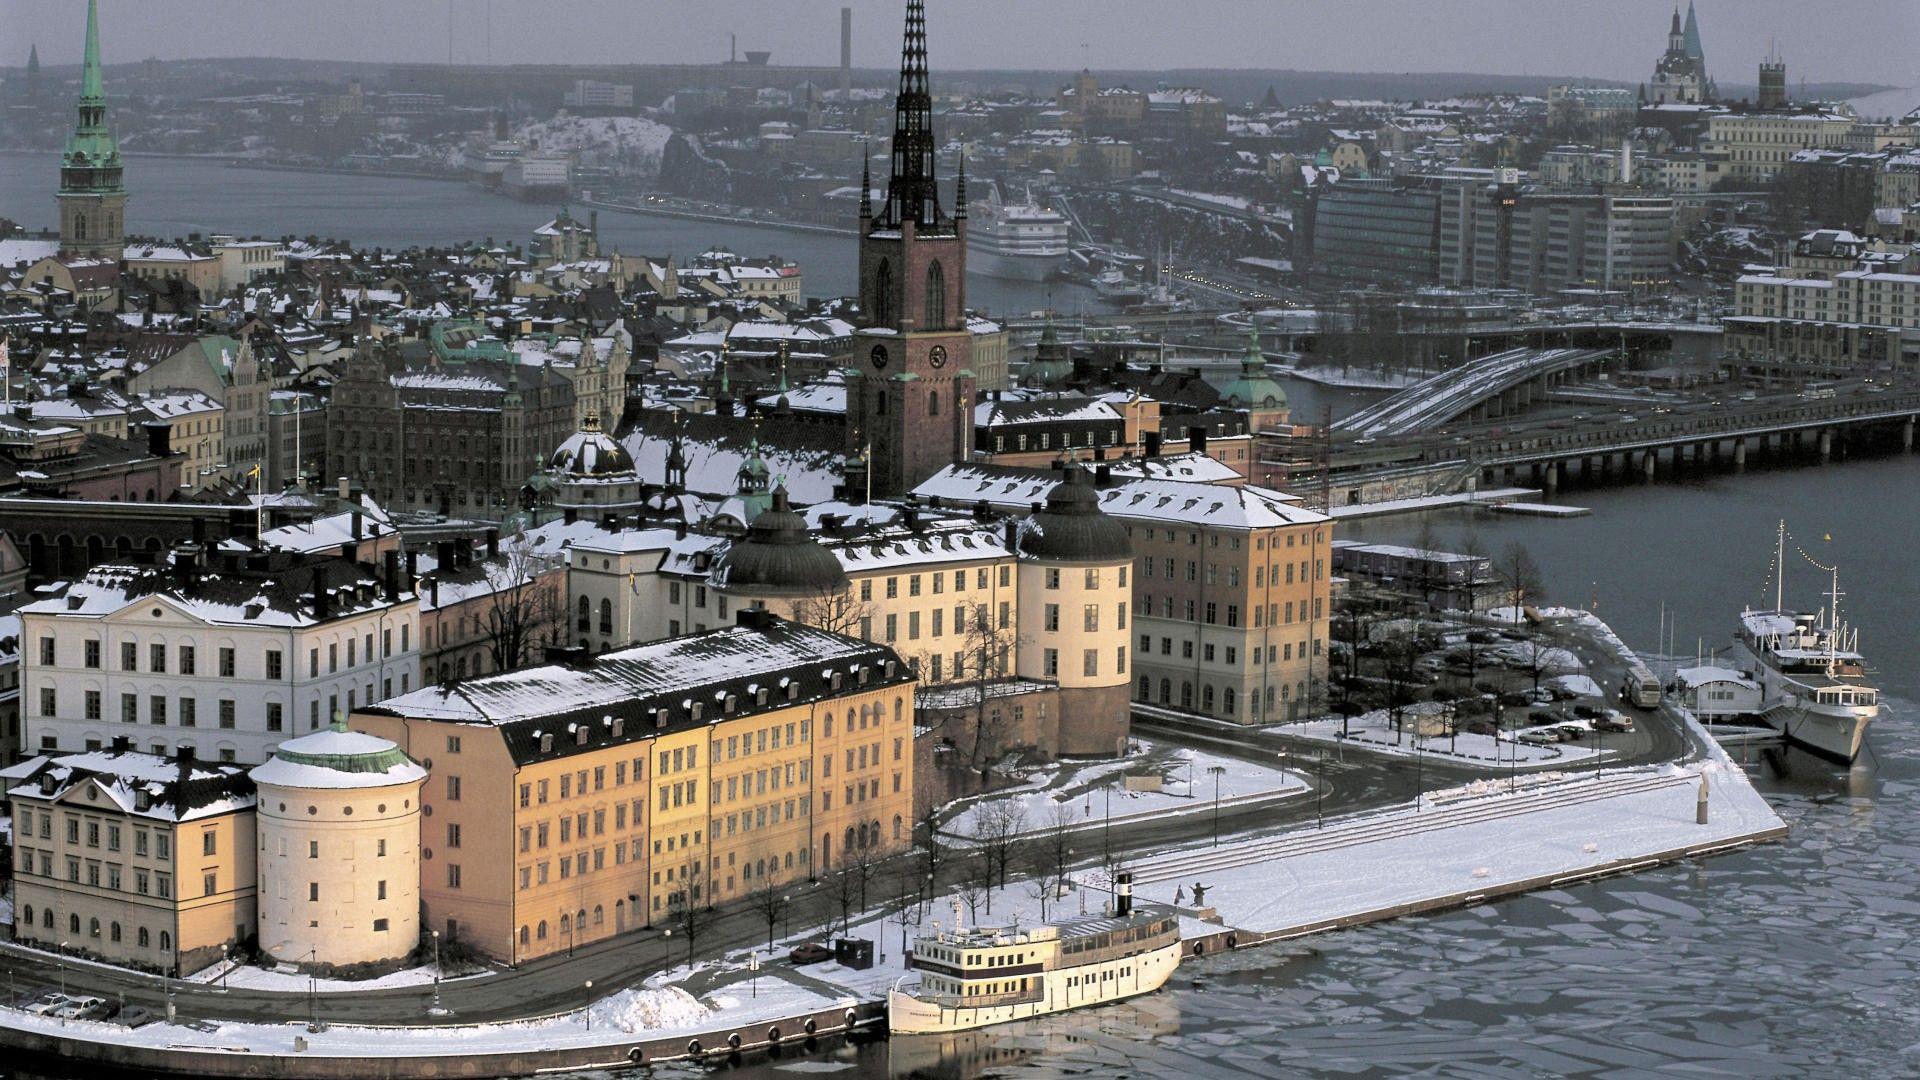 Sweden wallpaper photo full hd